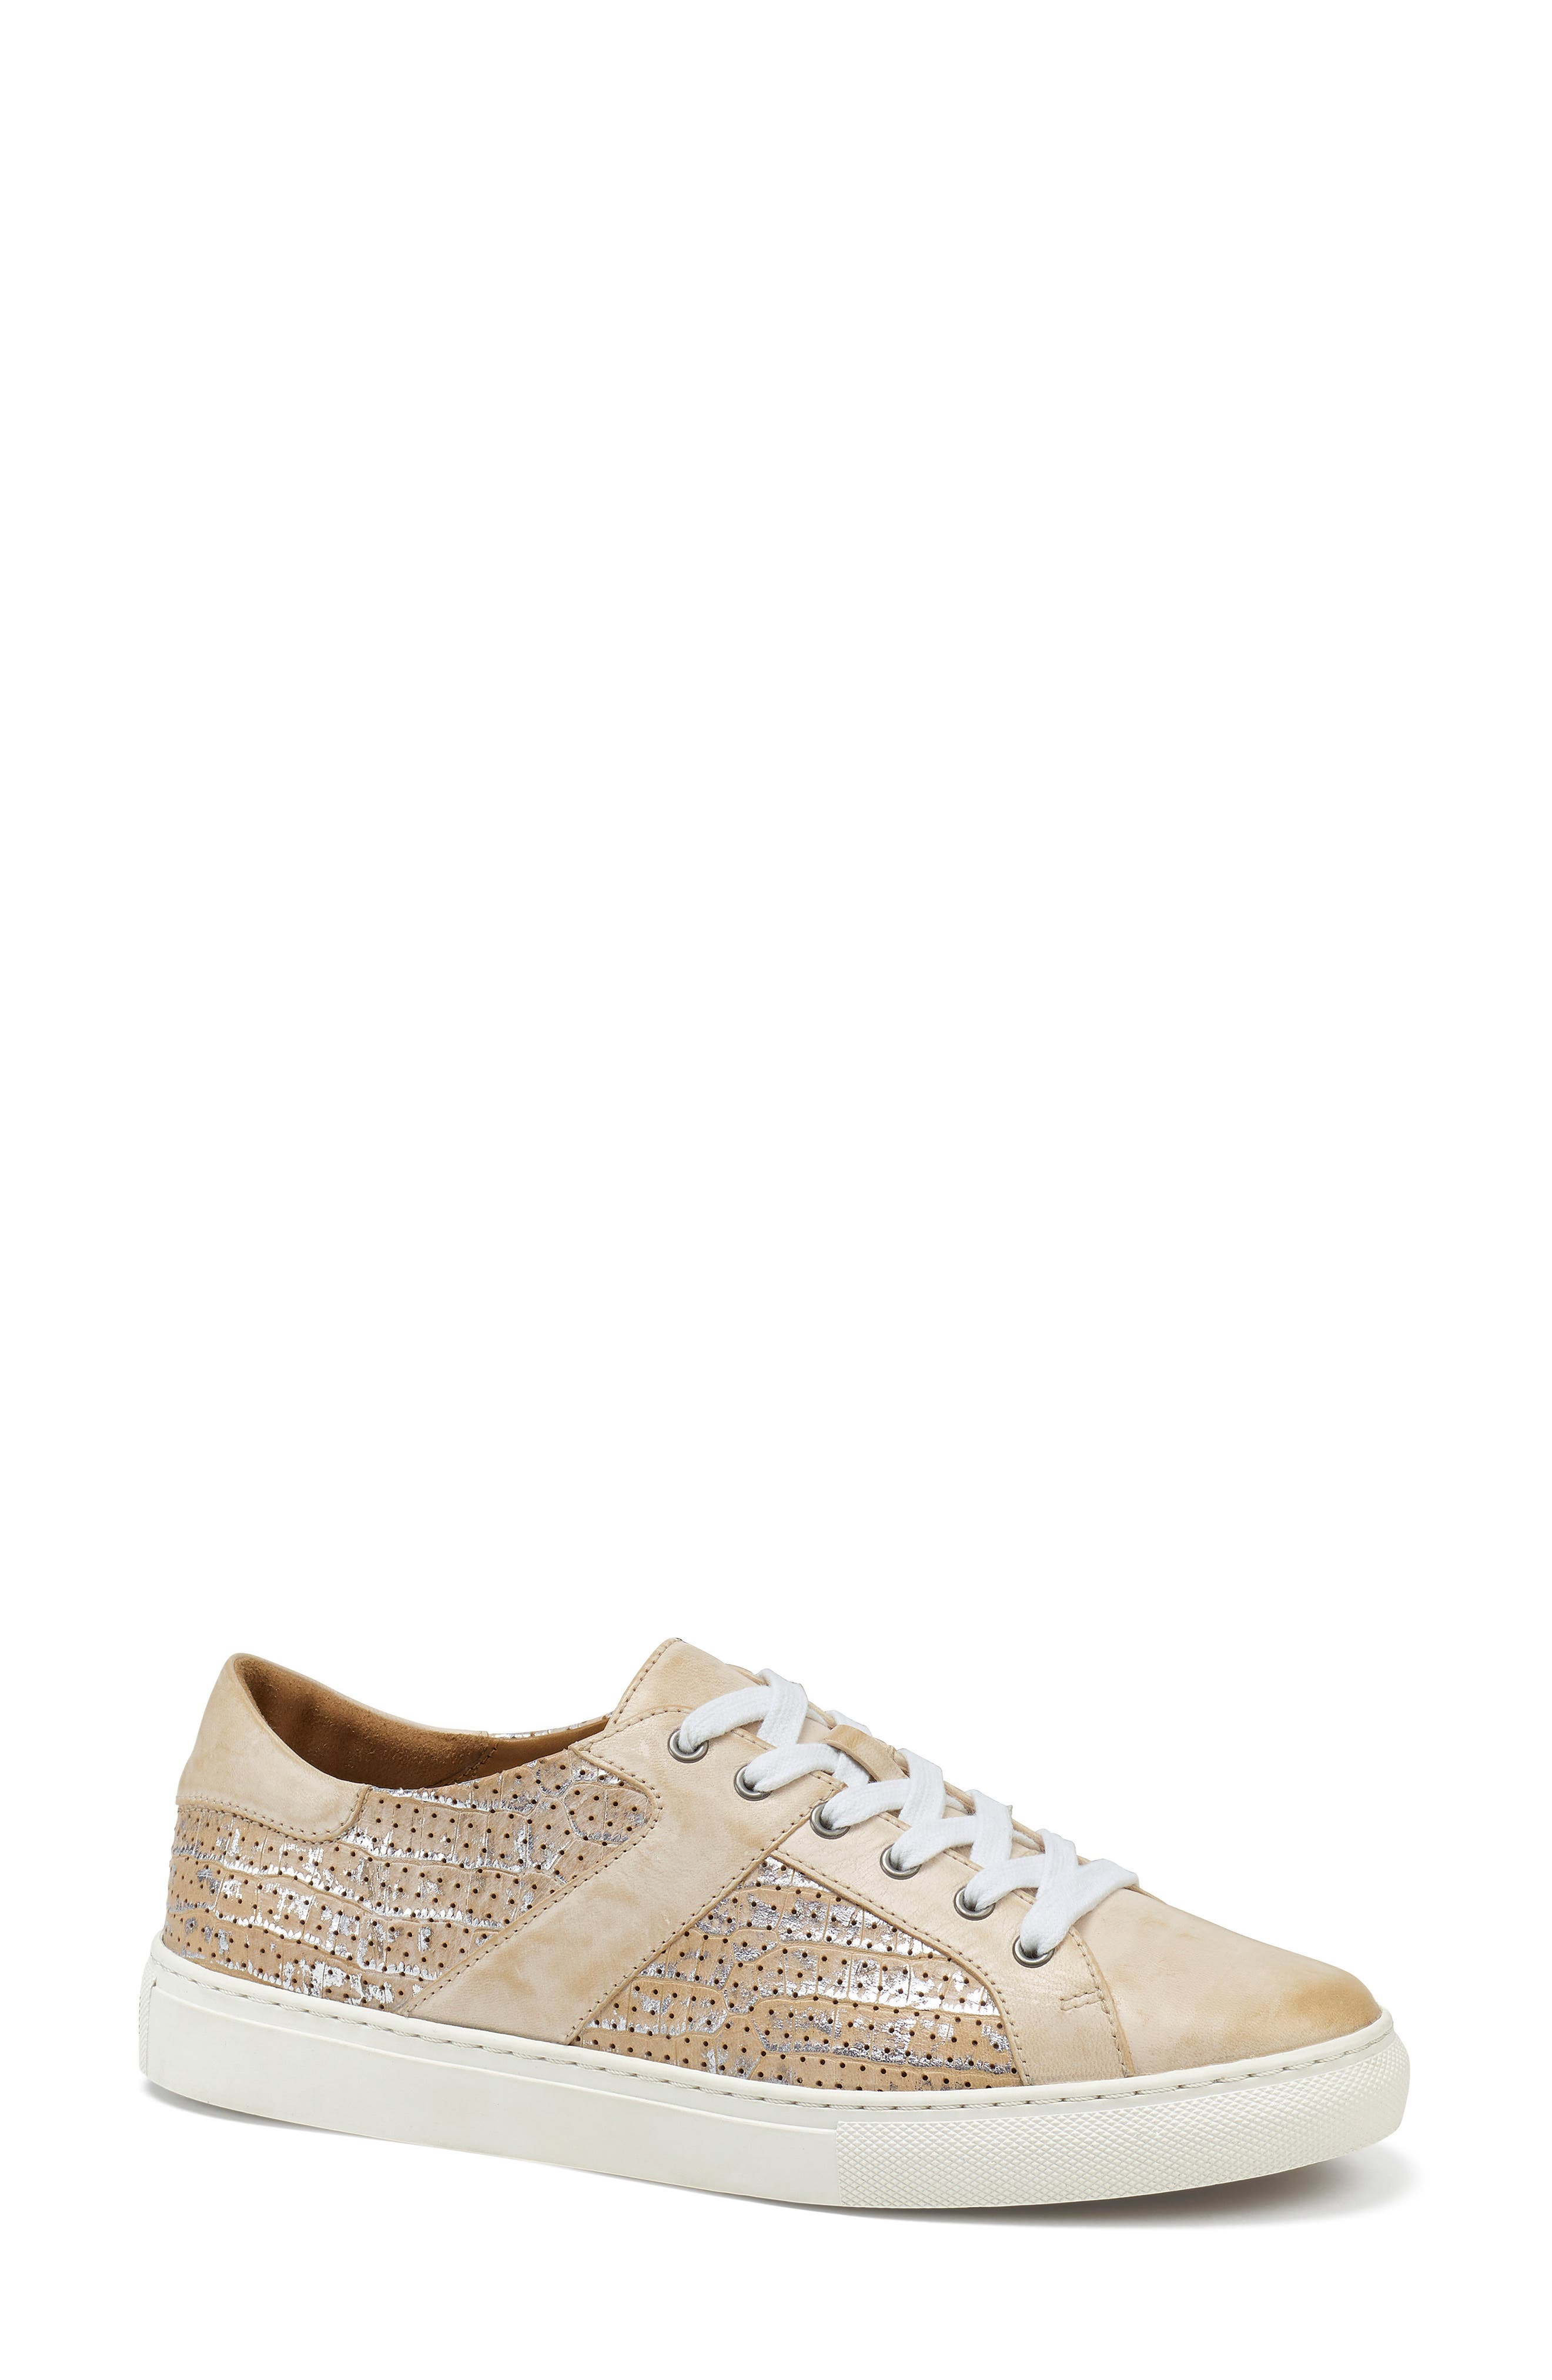 Trask Lindsey Sneaker- Ivory